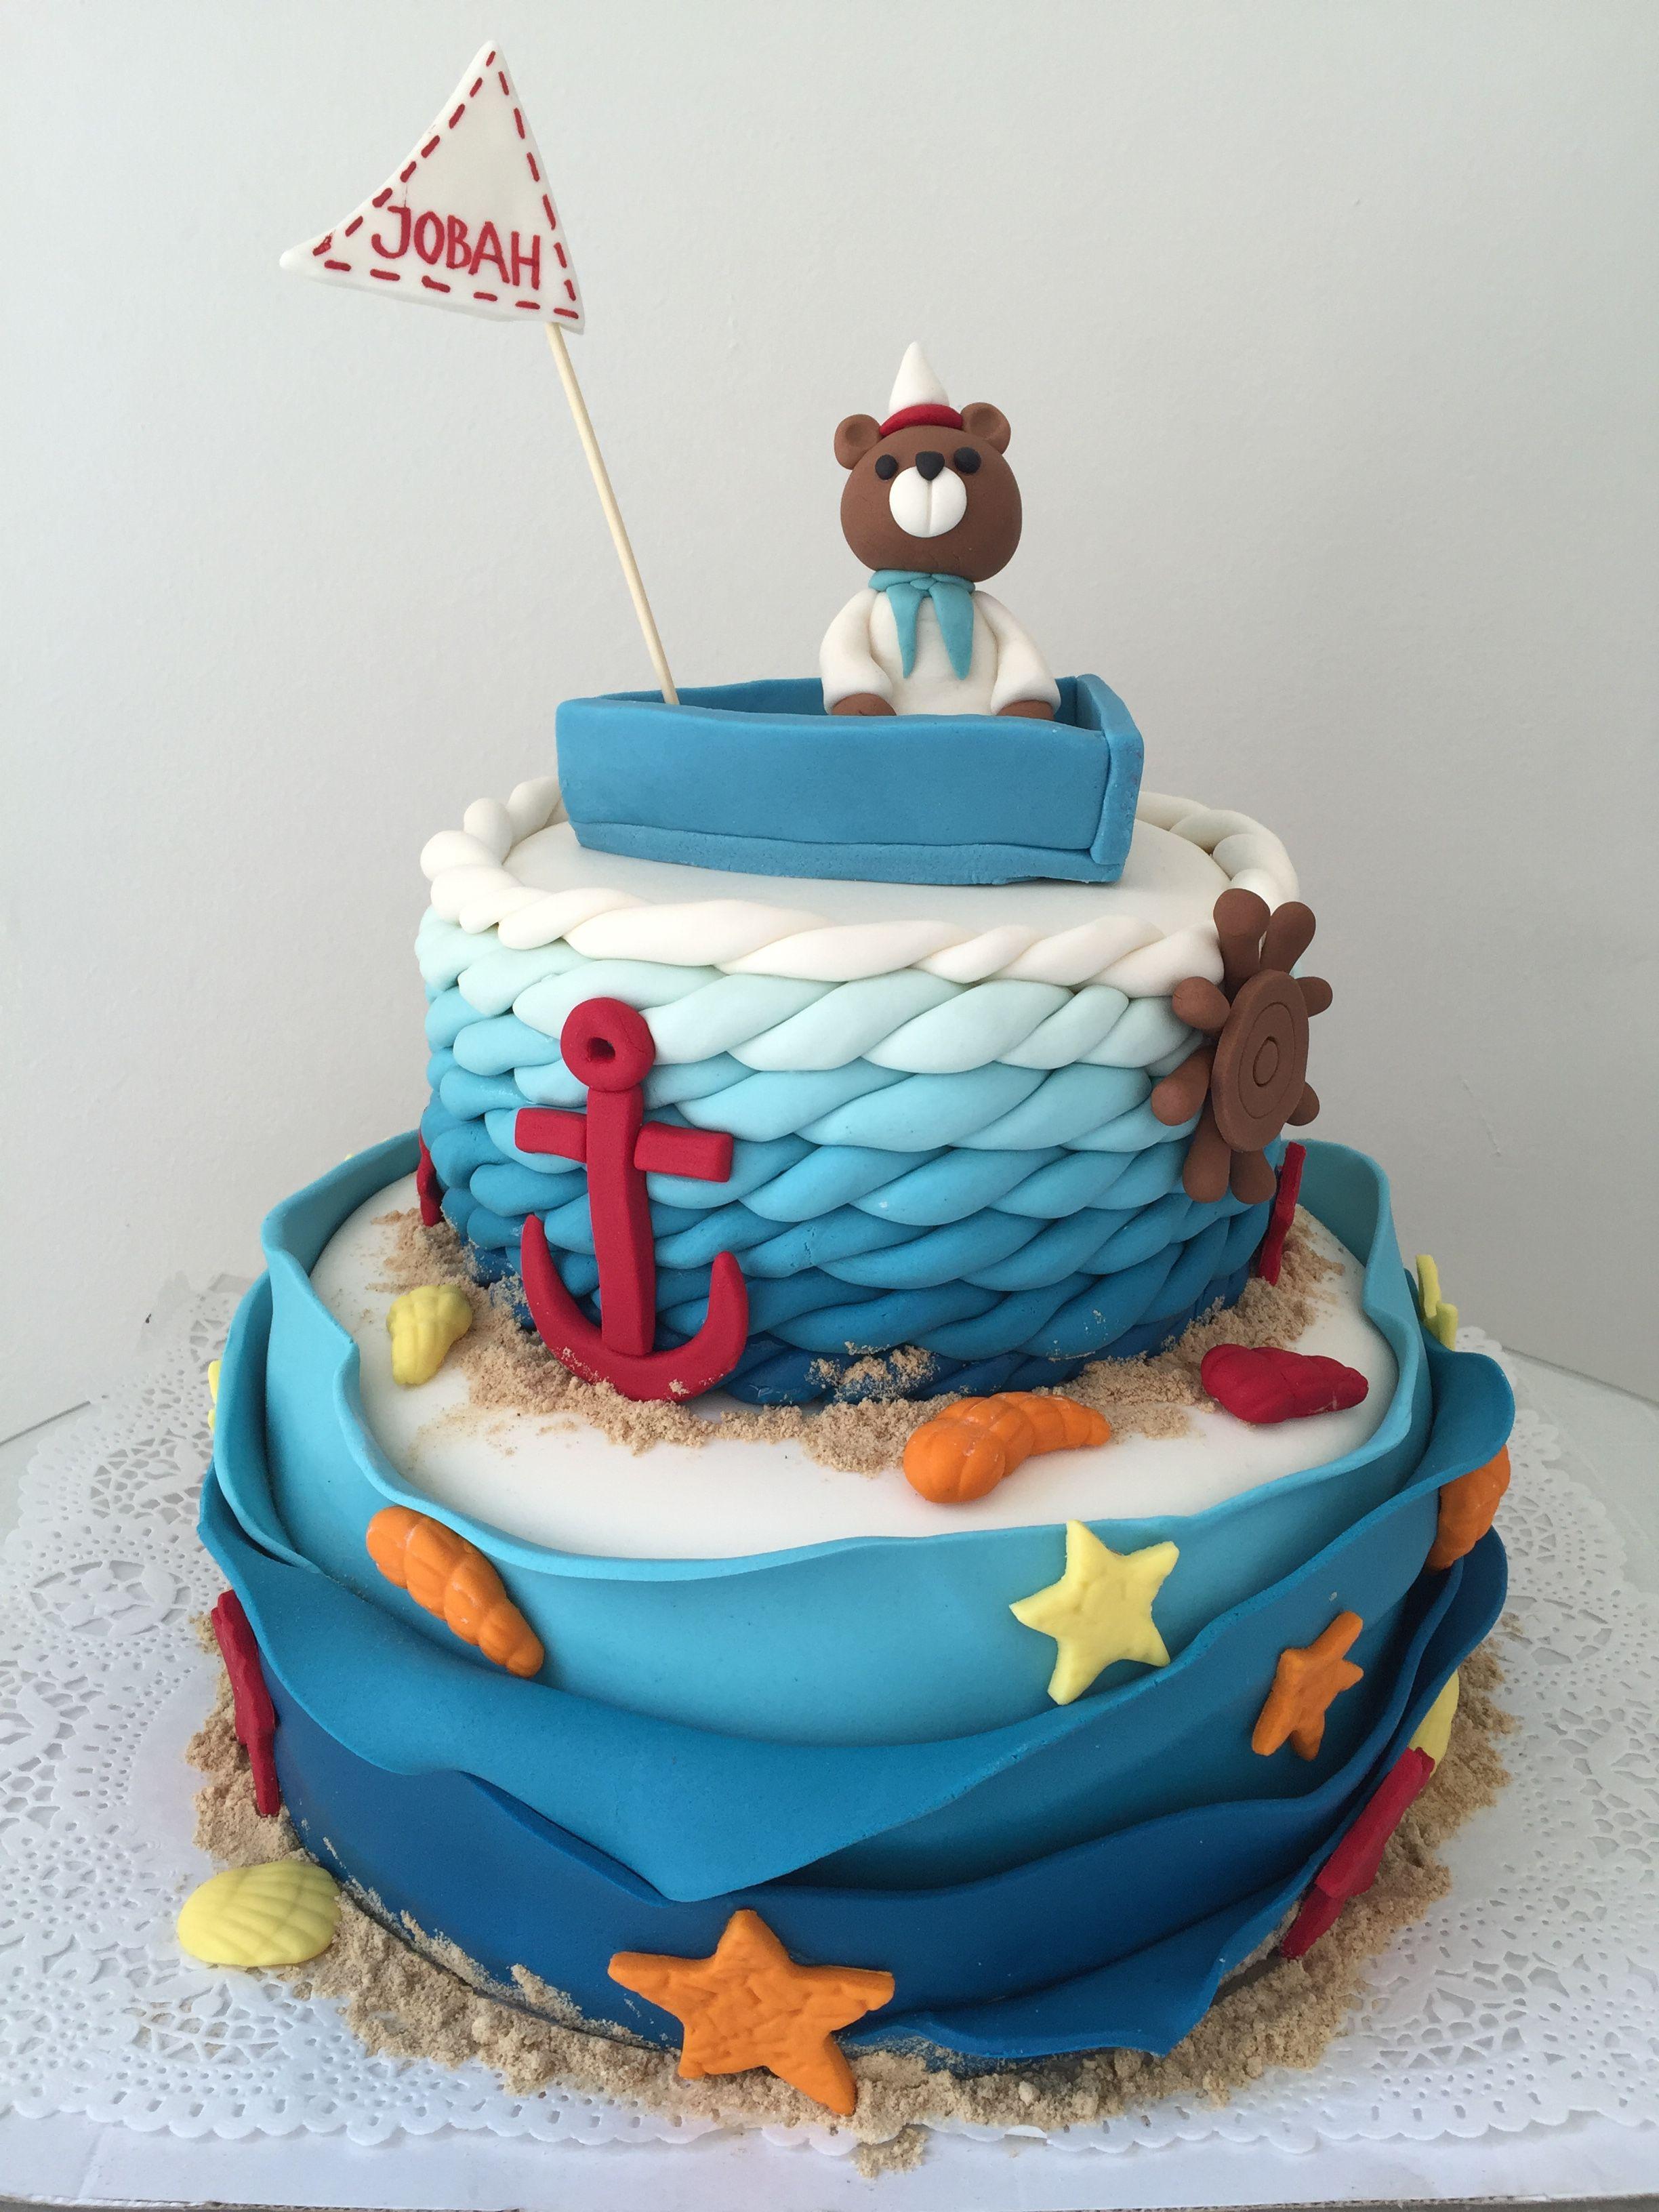 Odri Hepbern cake - Cake by Mocart DH - CakesDecor